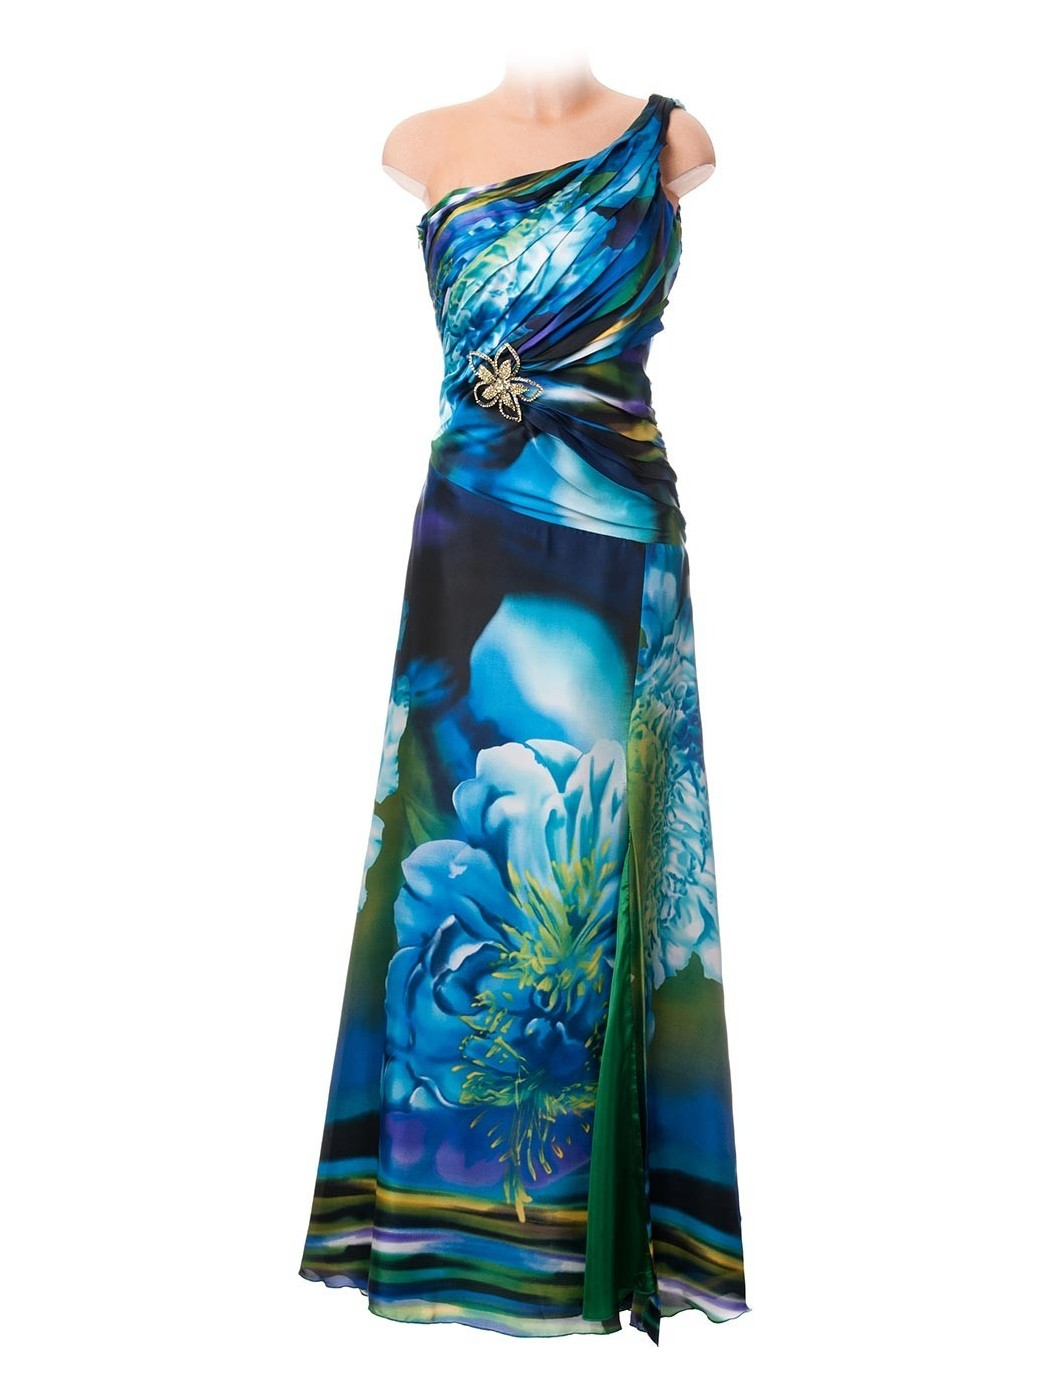 Sonia Peña one shoulder dress